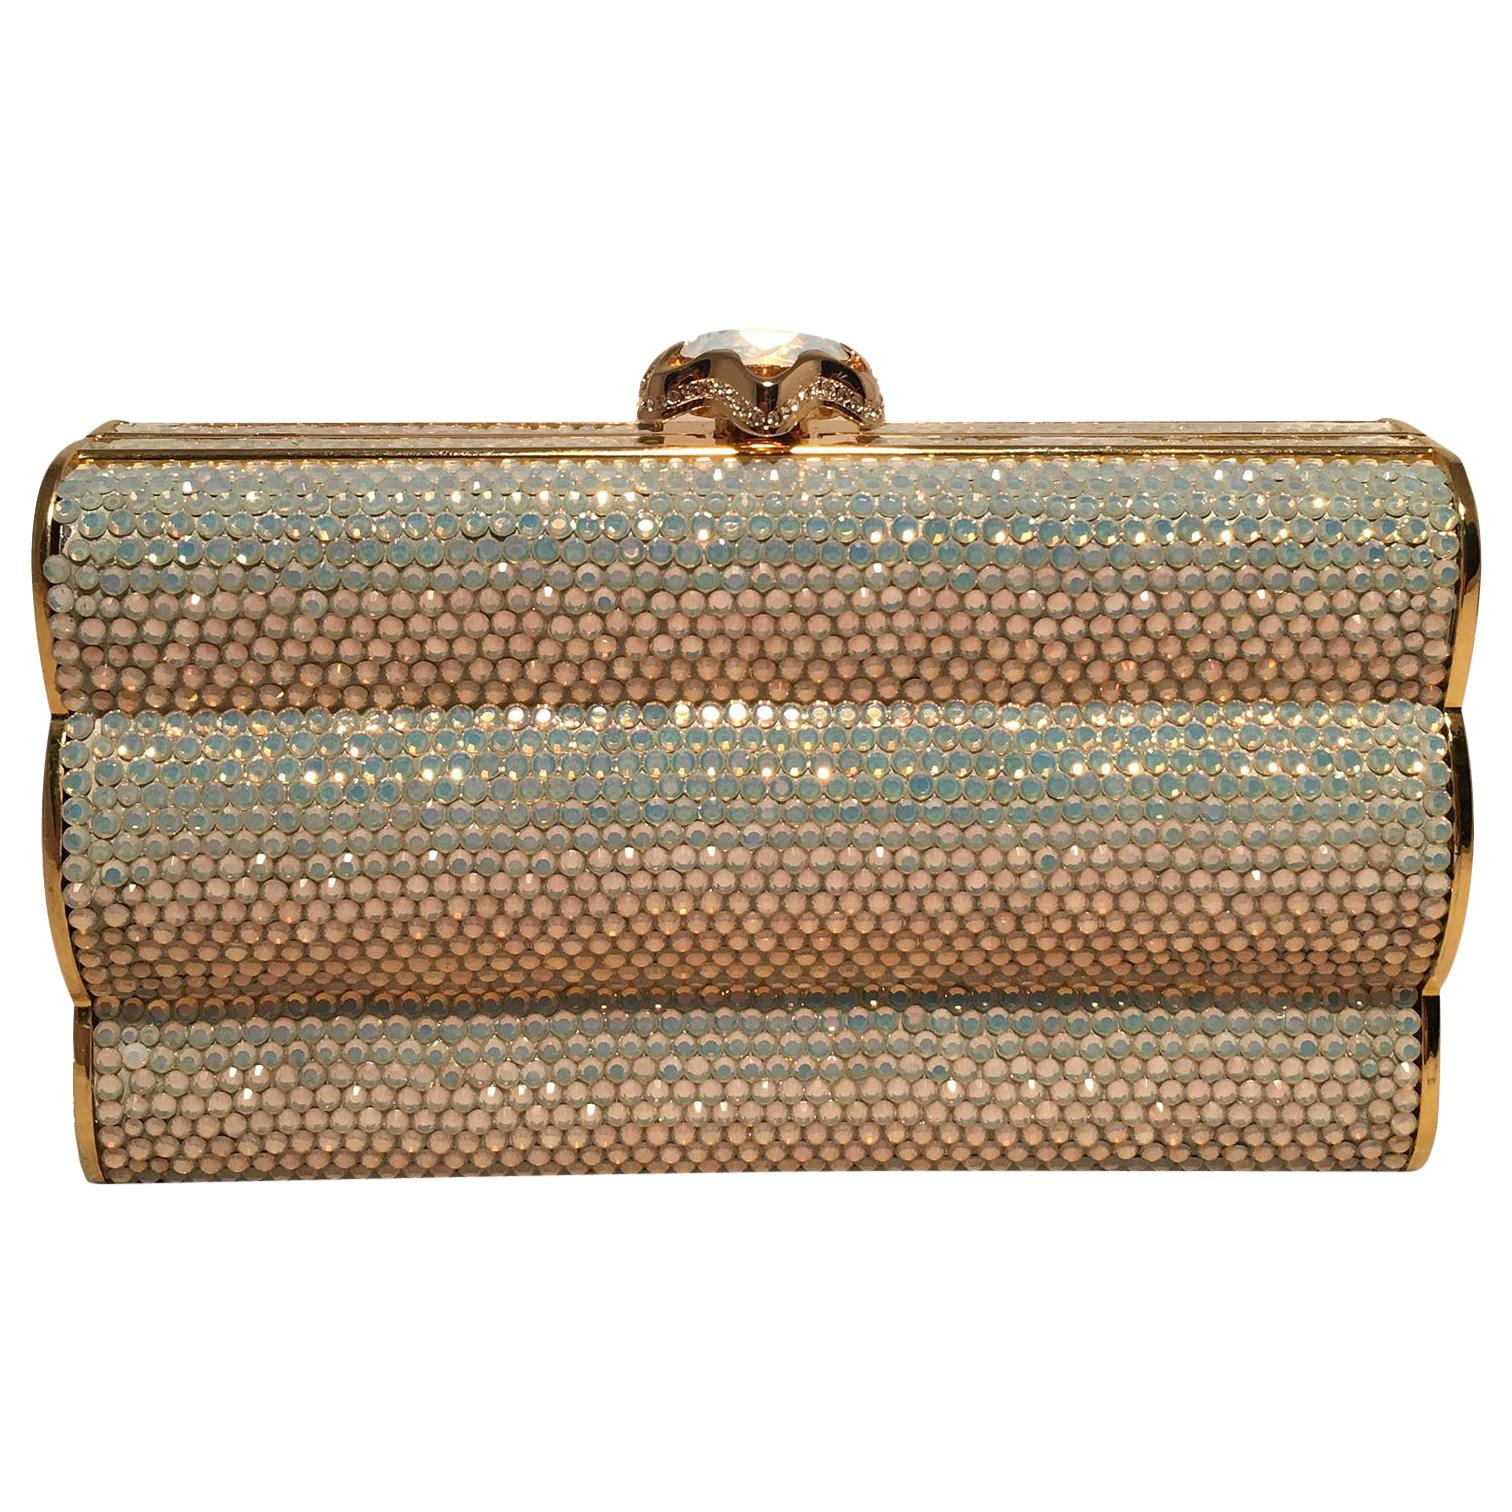 Judith Leiber Iridescent Swarovski Crystal Gold Minaudiere Evening Bag Clutch